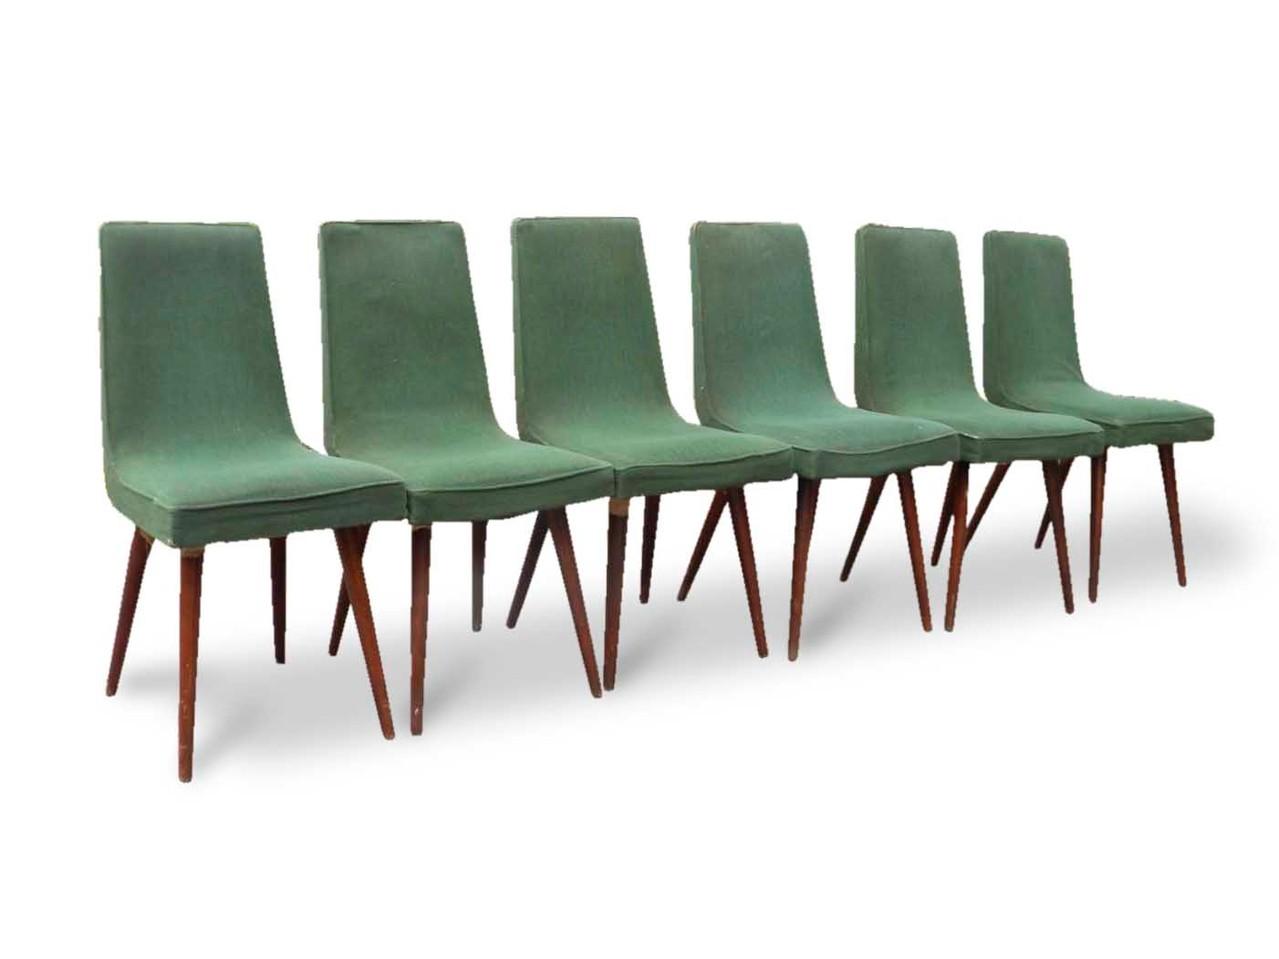 Sedie Vintage Anni 50 : Sedie vintage anni 50 italian vintage sofa